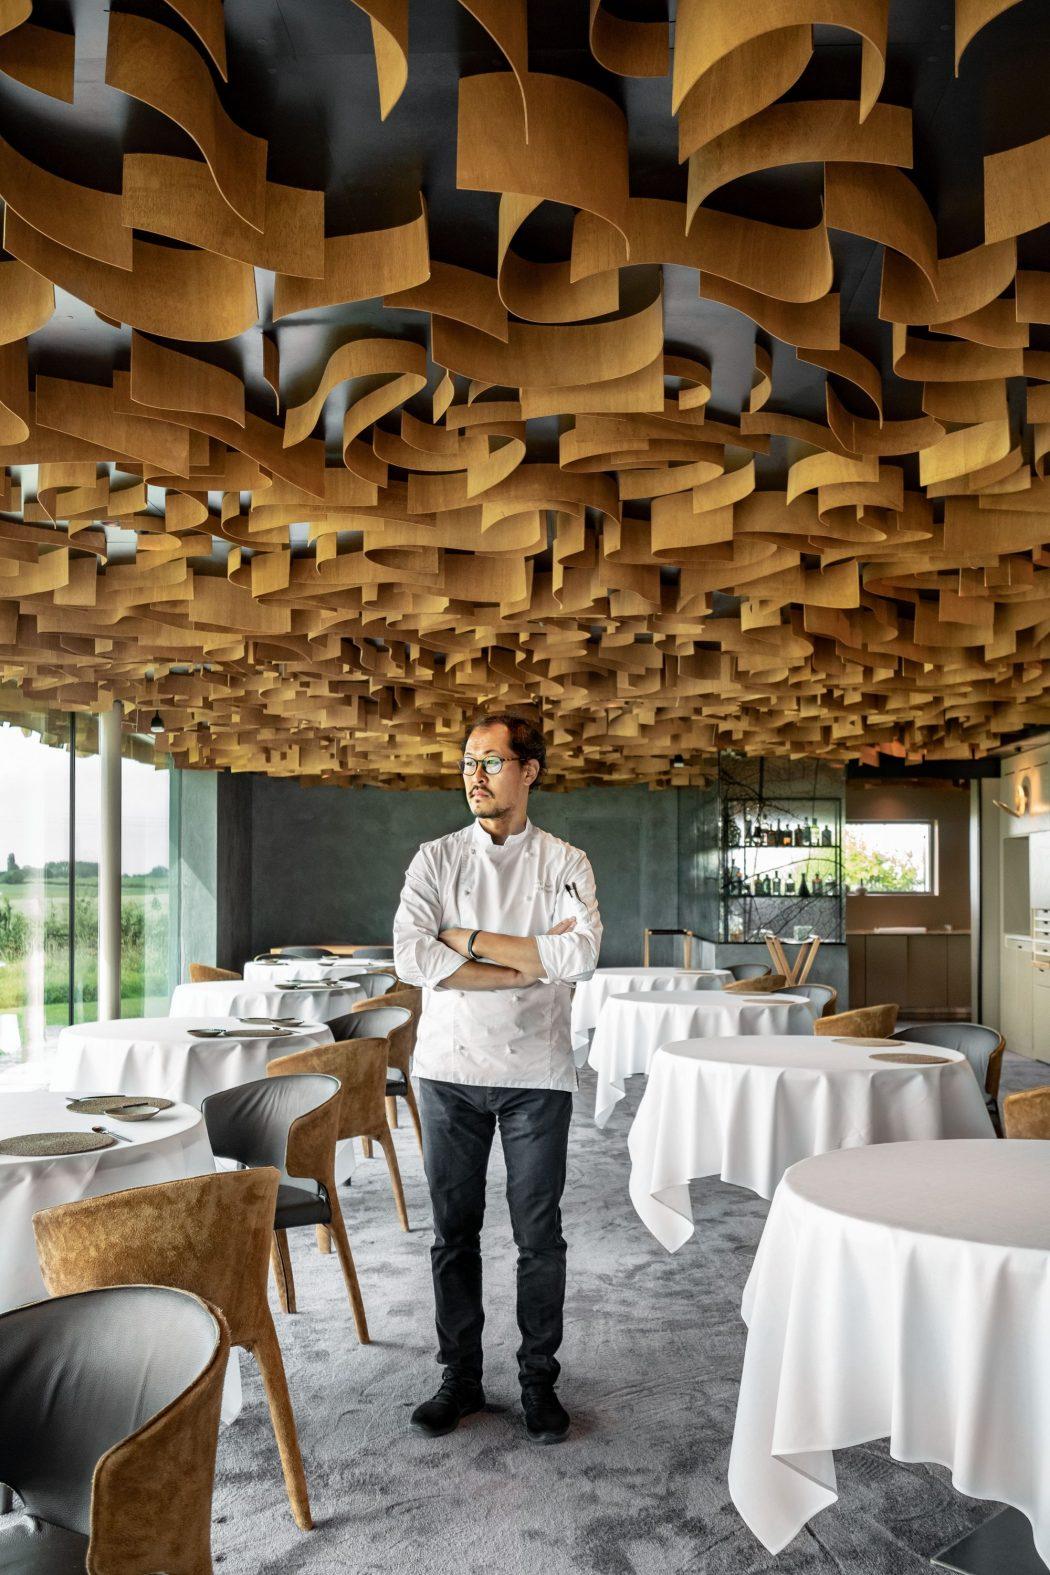 Sang Hoon Degiembre Air du temps restaurant